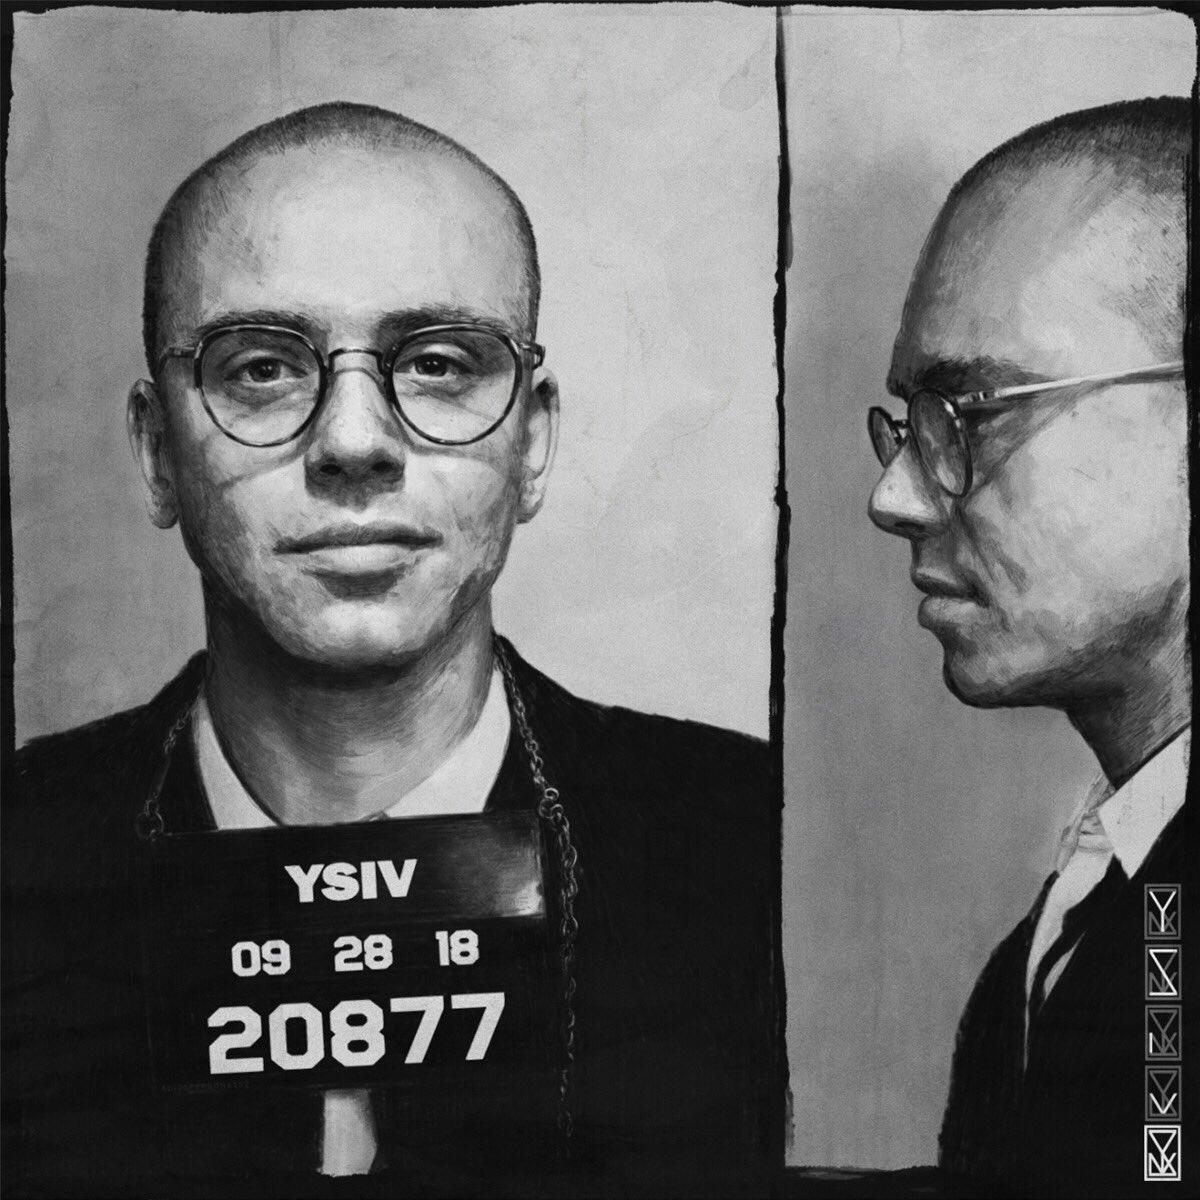 .@Logic301 Reveals 'YSIV' Track List with Wu-Tang Clan, Wale & Jaden Smith https://t.co/hABUsqTyYm  https://t.co/lFXQHuXeQo